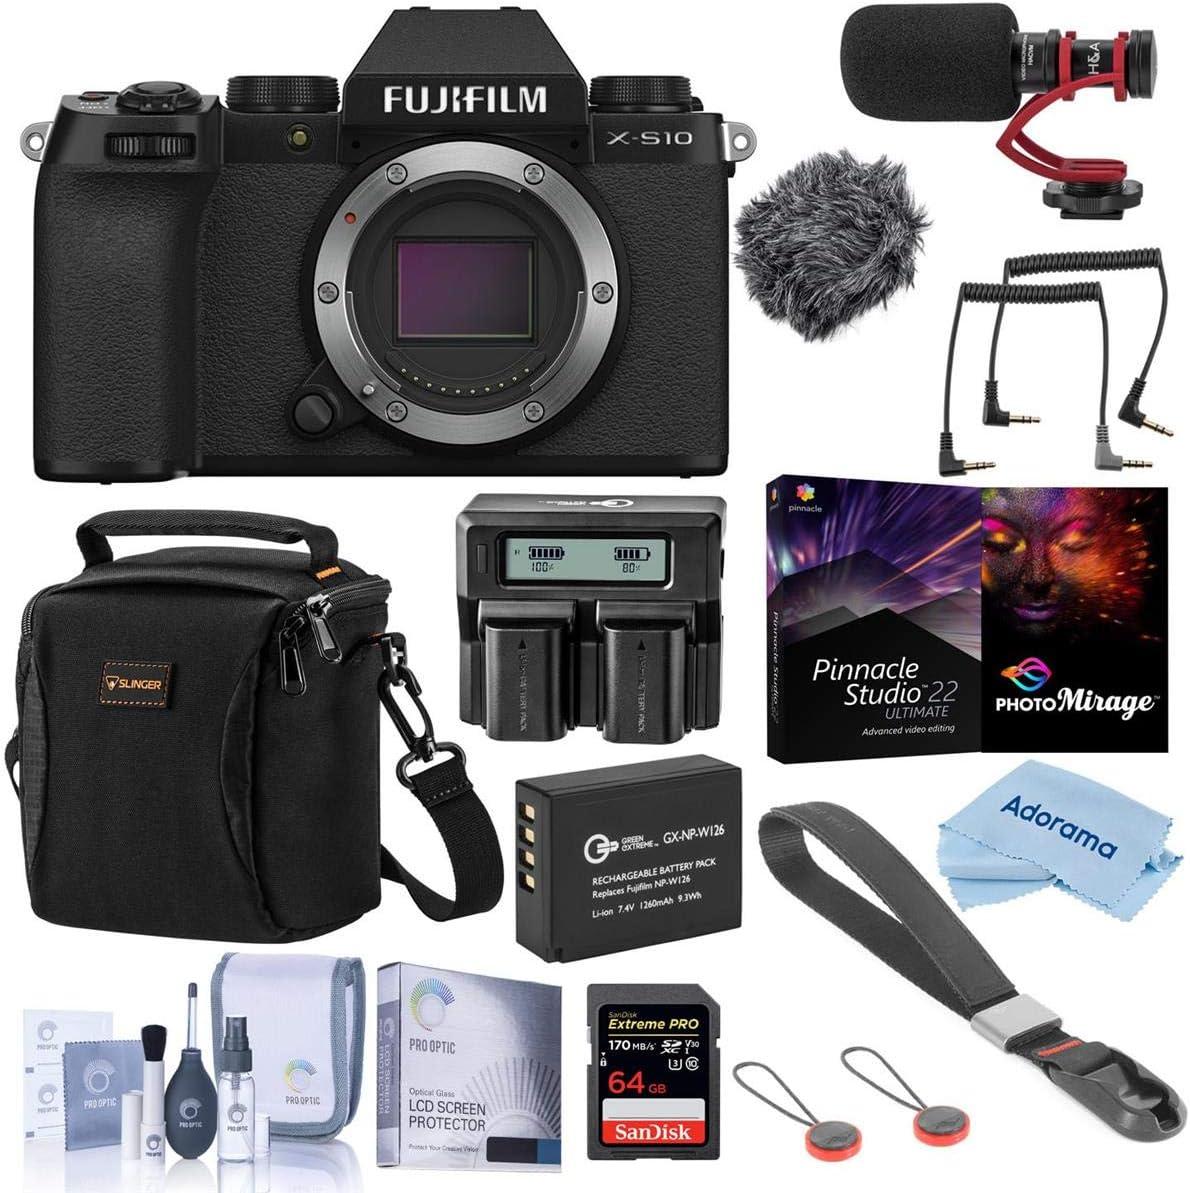 Fujifilm X-S10 trend rank Mirrorless Camera Black - Bundle with Premium Shipping included Ac